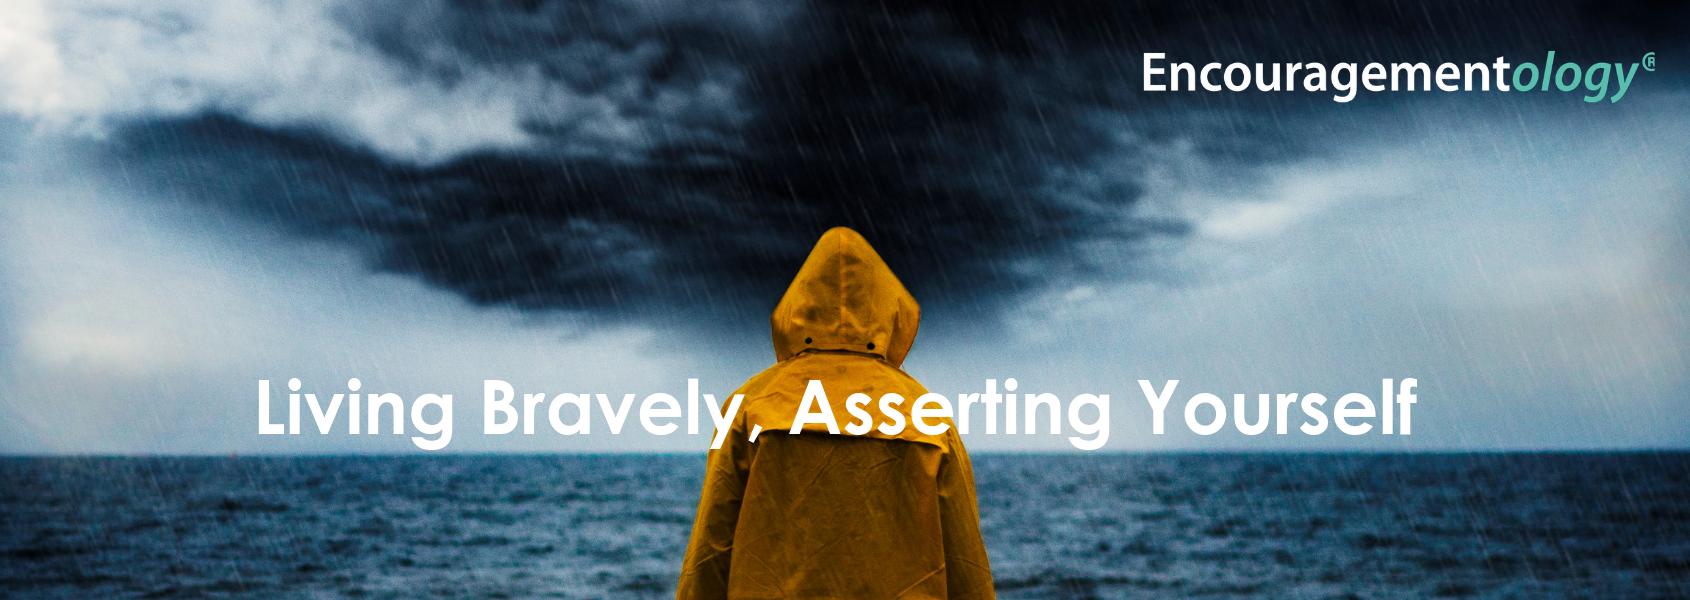 Living Bravely, Asserting Yourself